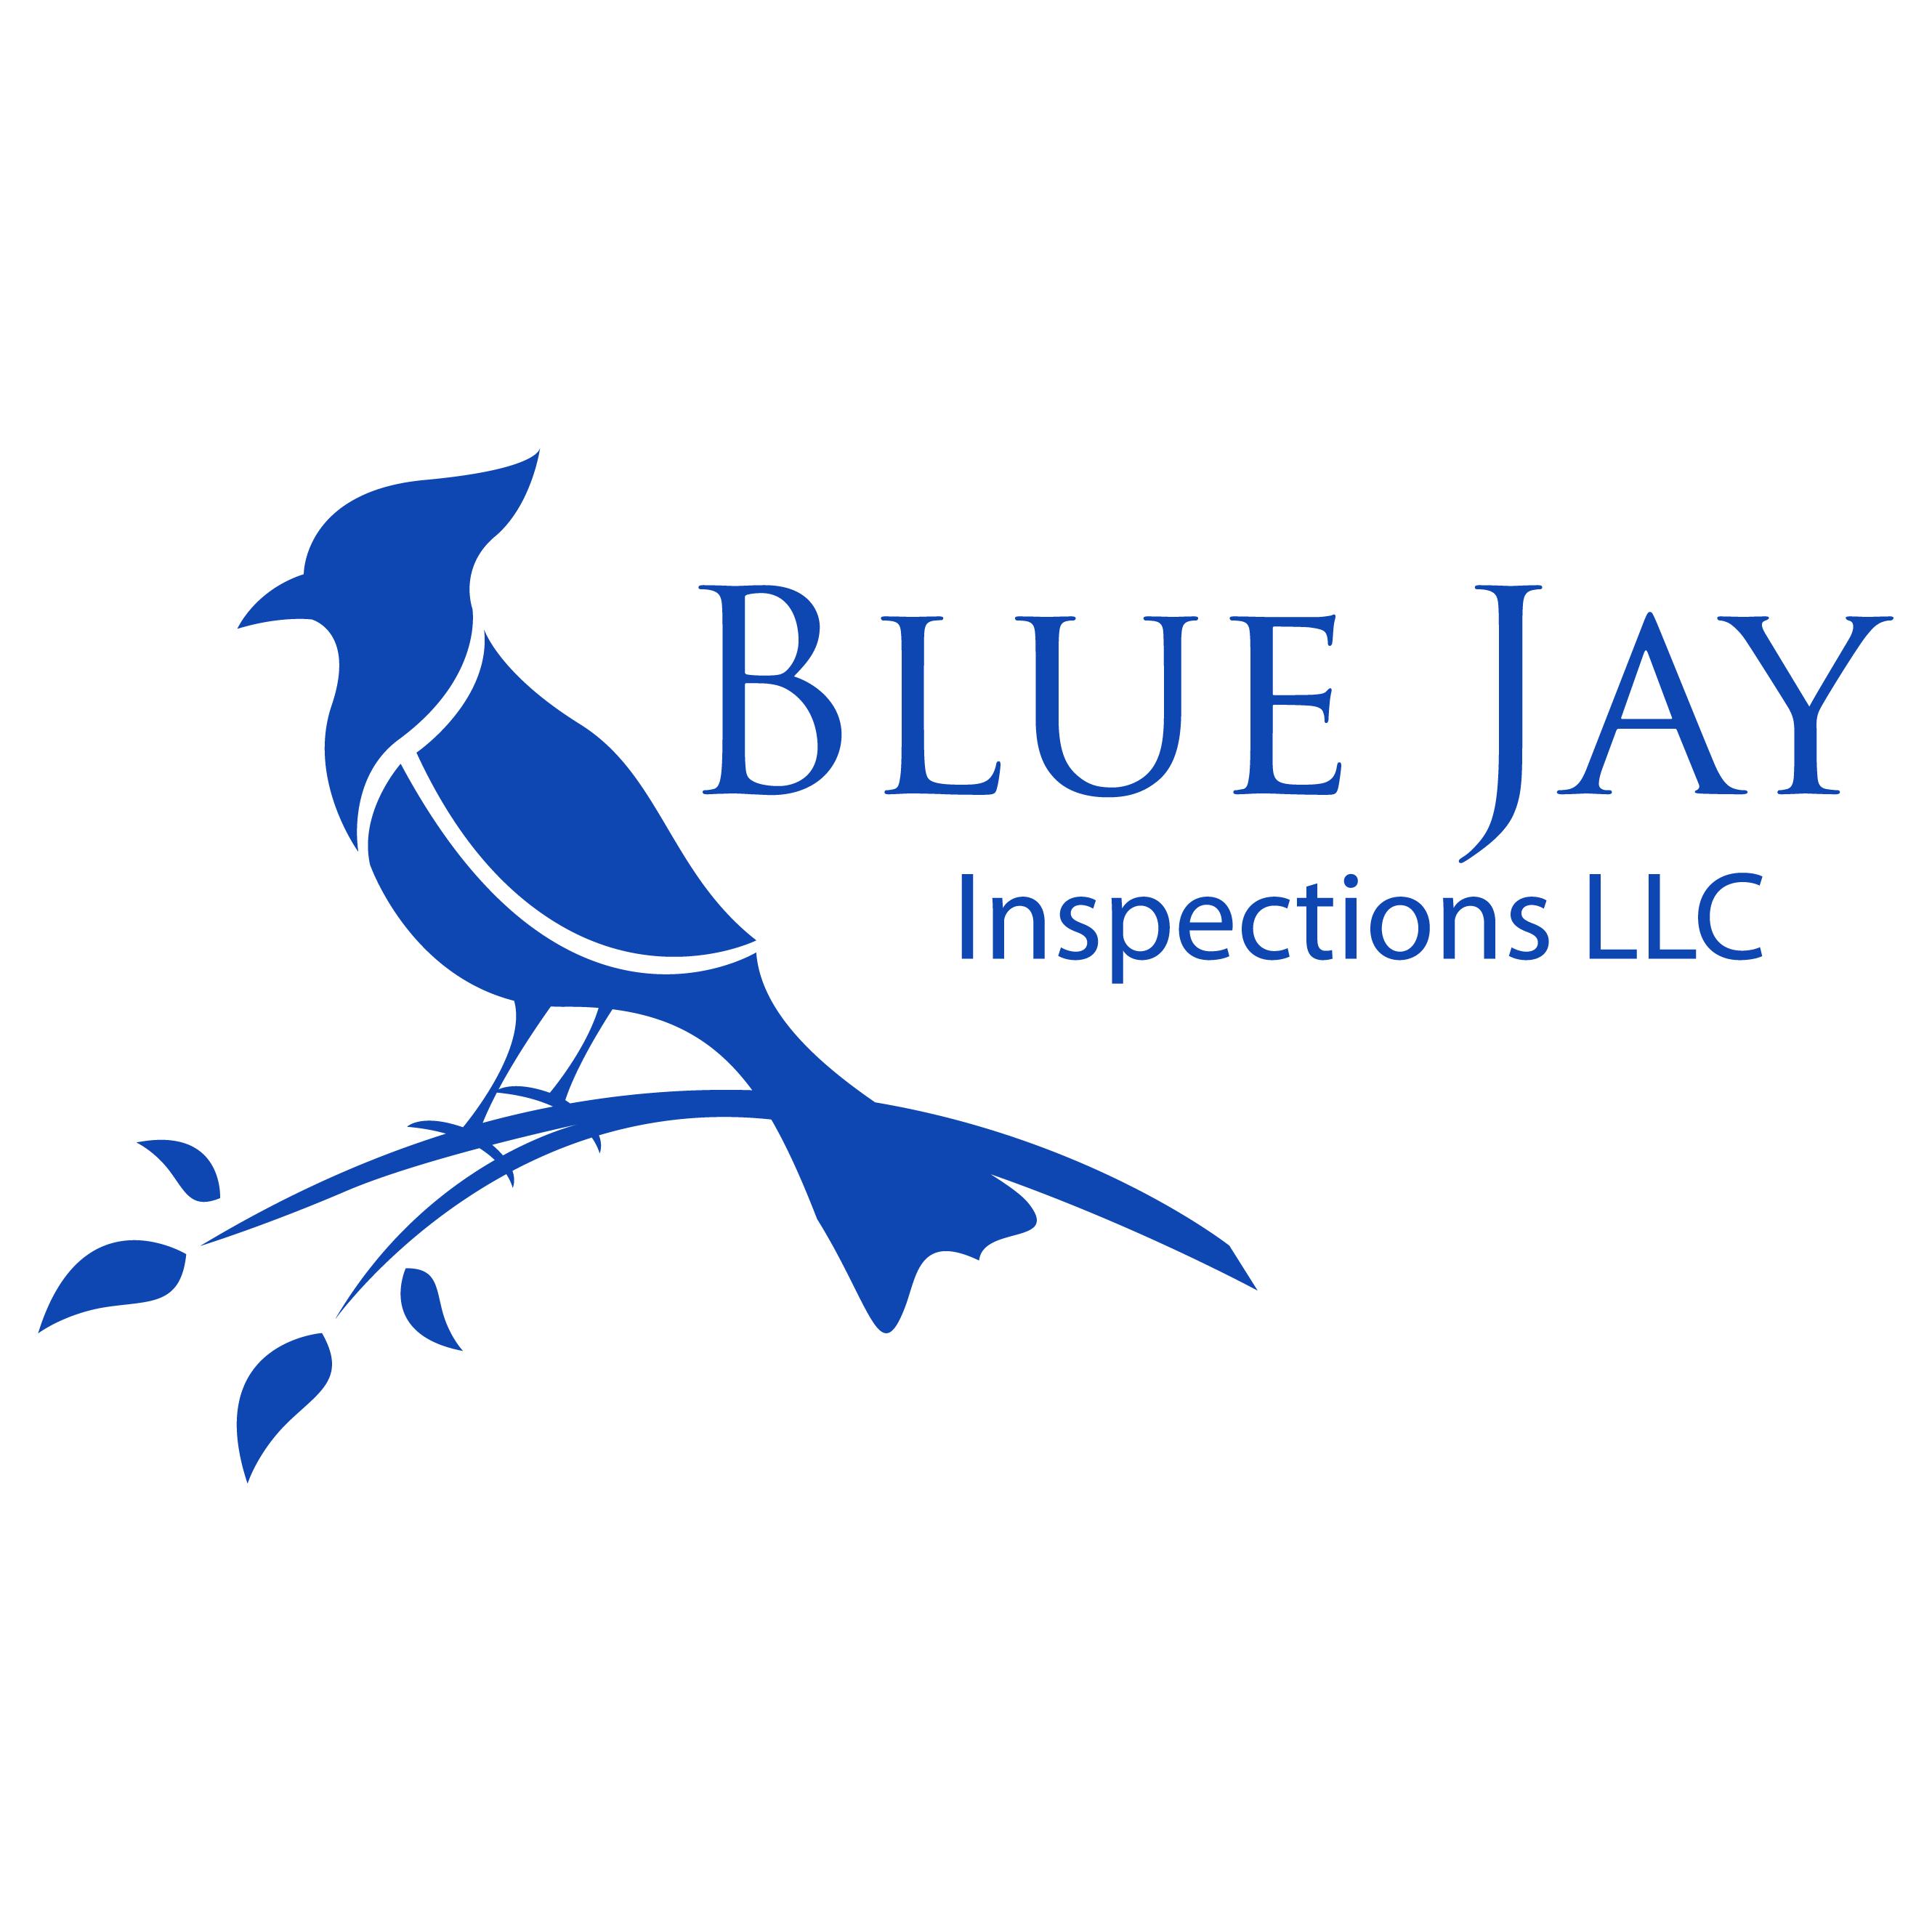 Blue Jay Inspections Llc